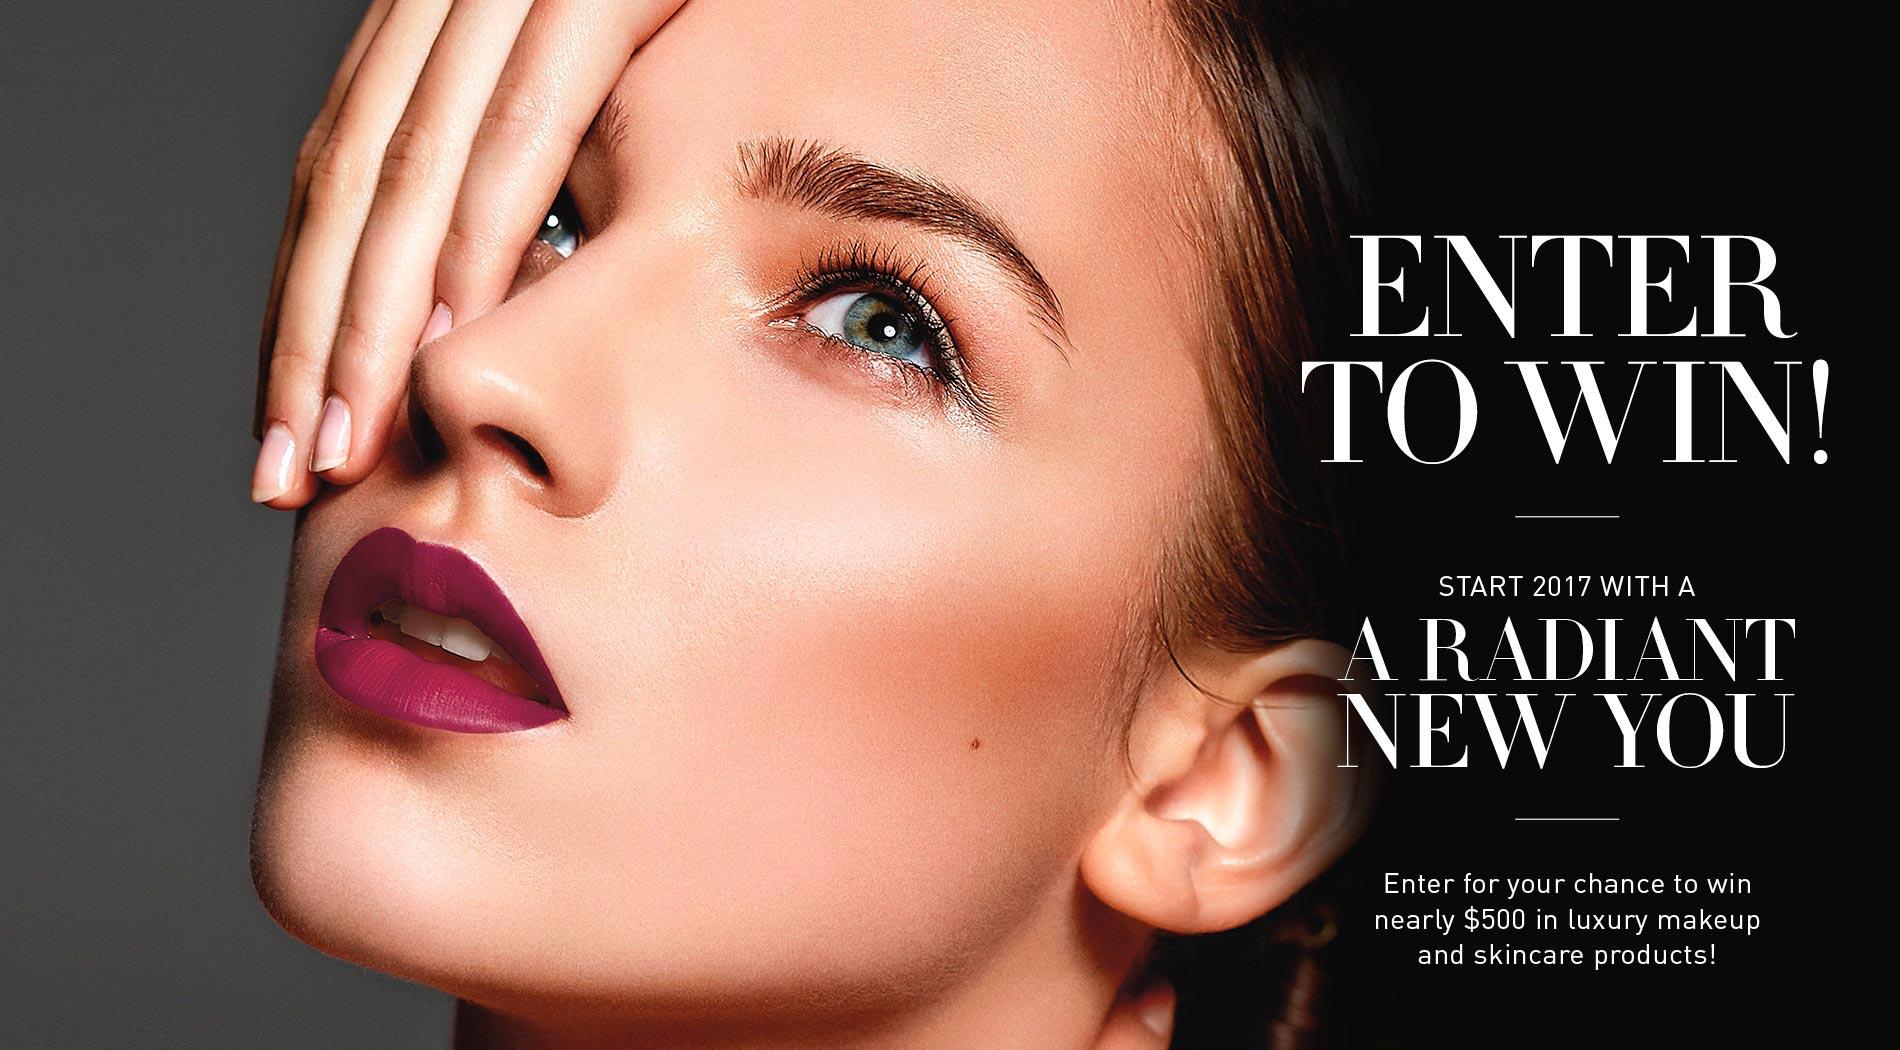 VIE Magazine Bruce Wayne Makeup Giveaway